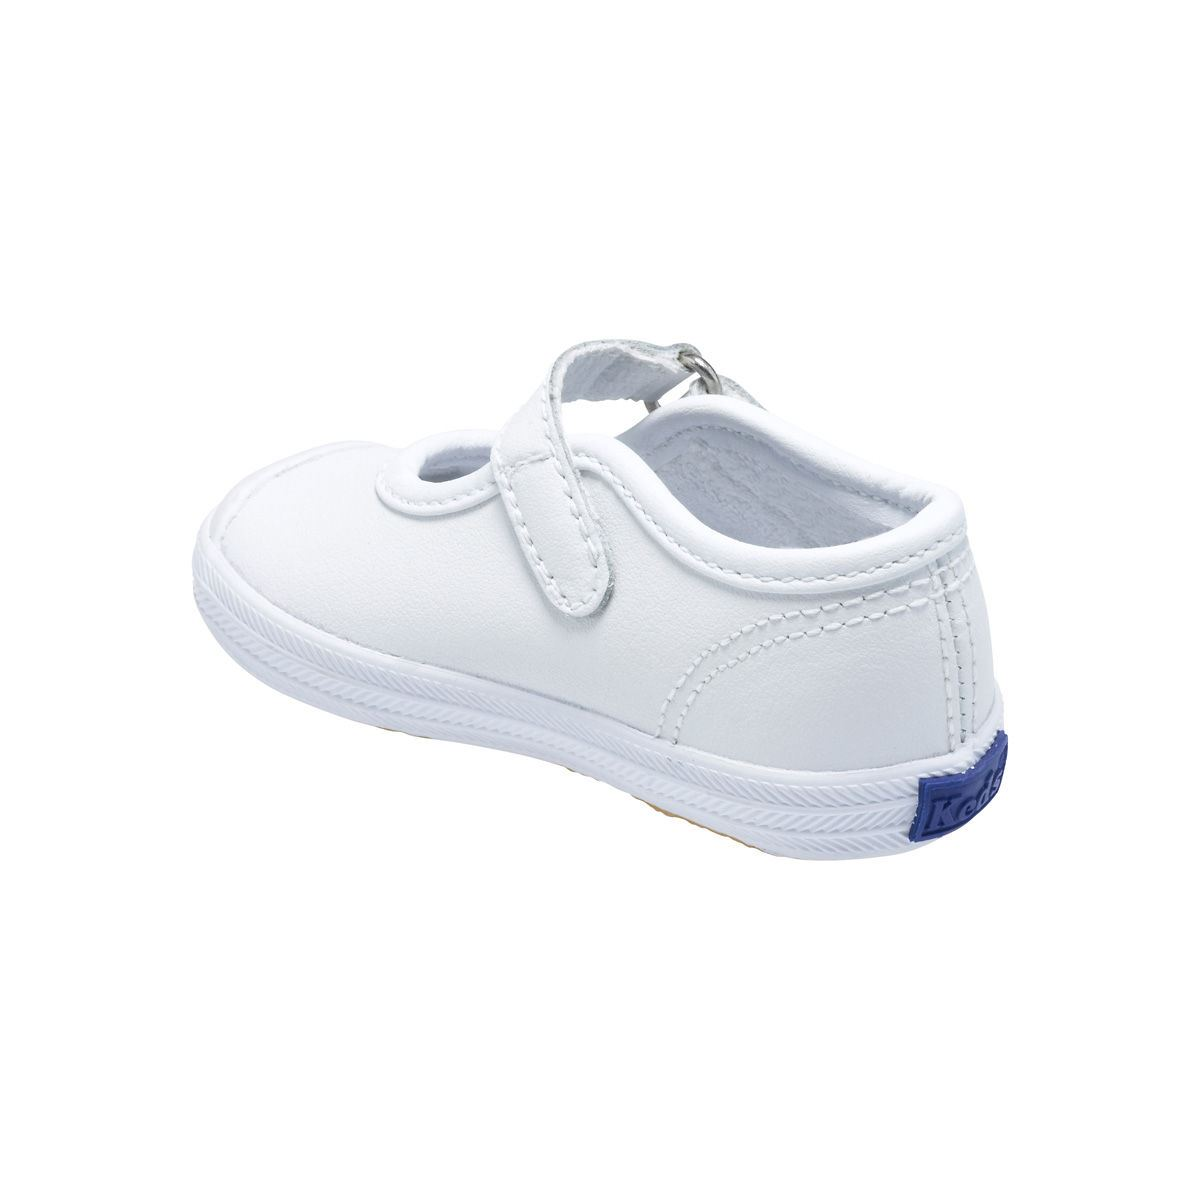 keds infant shoes size 0